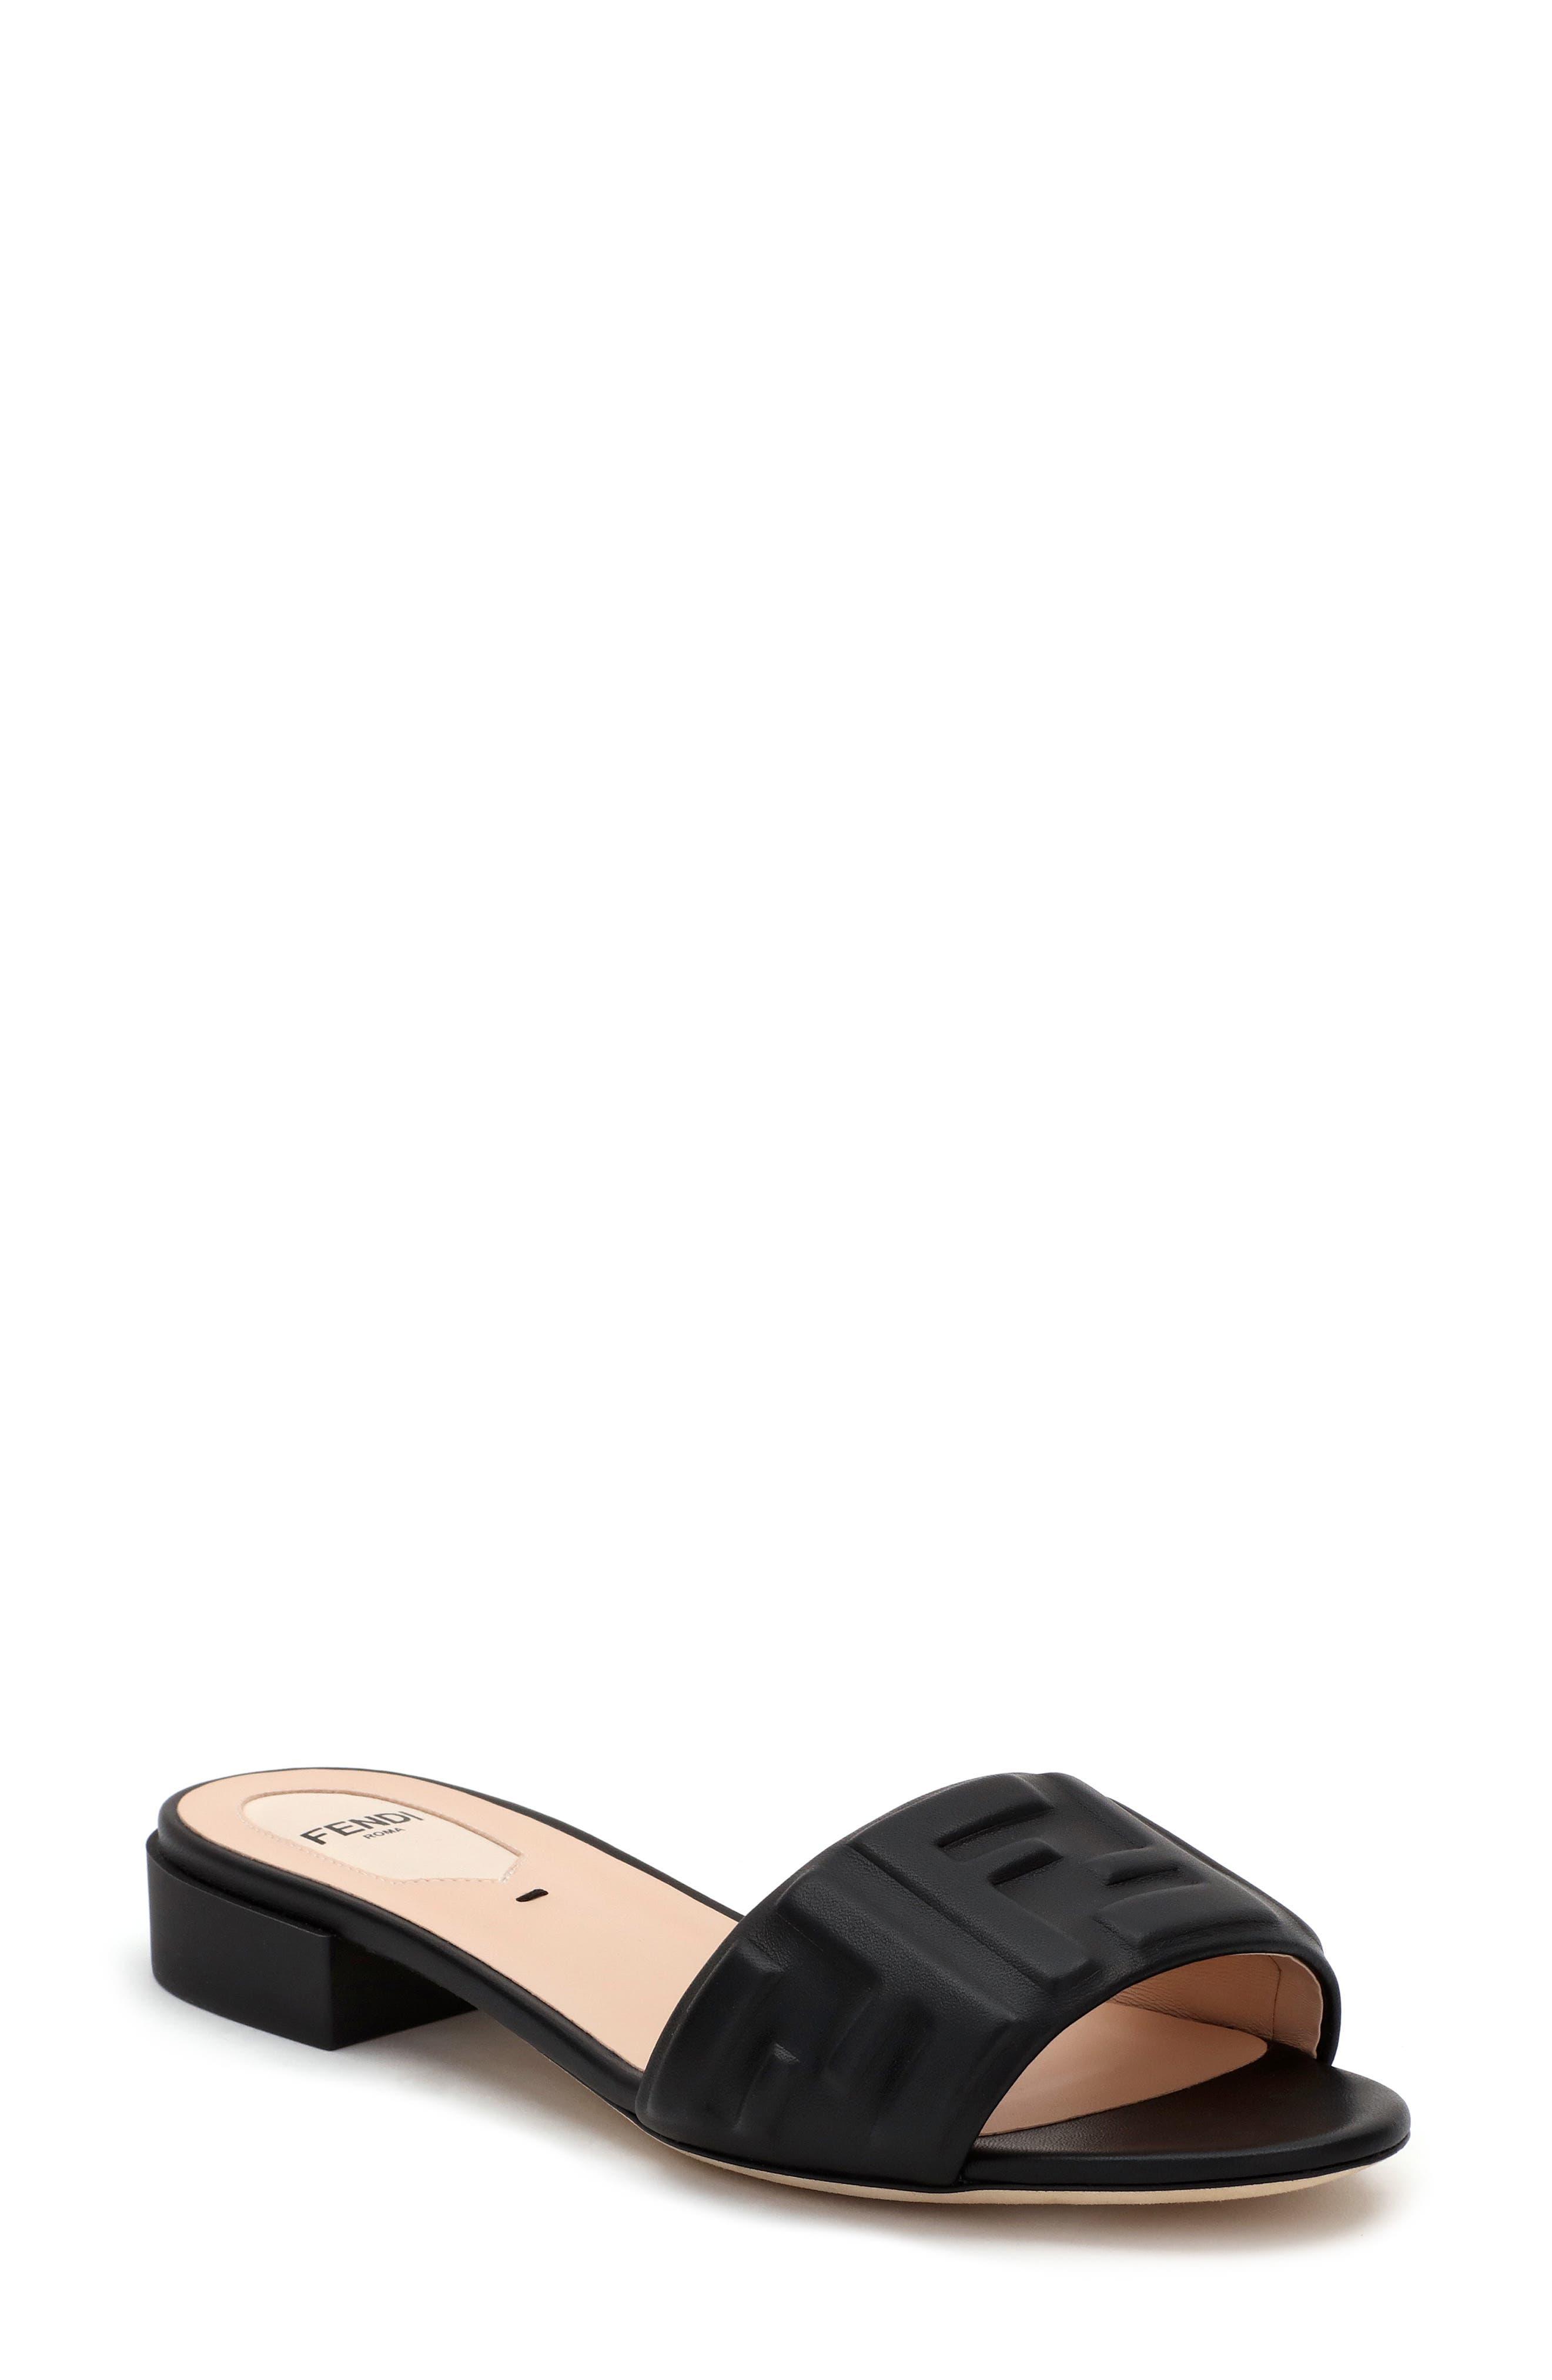 Women's Fendi Sandals and Flip-Flops